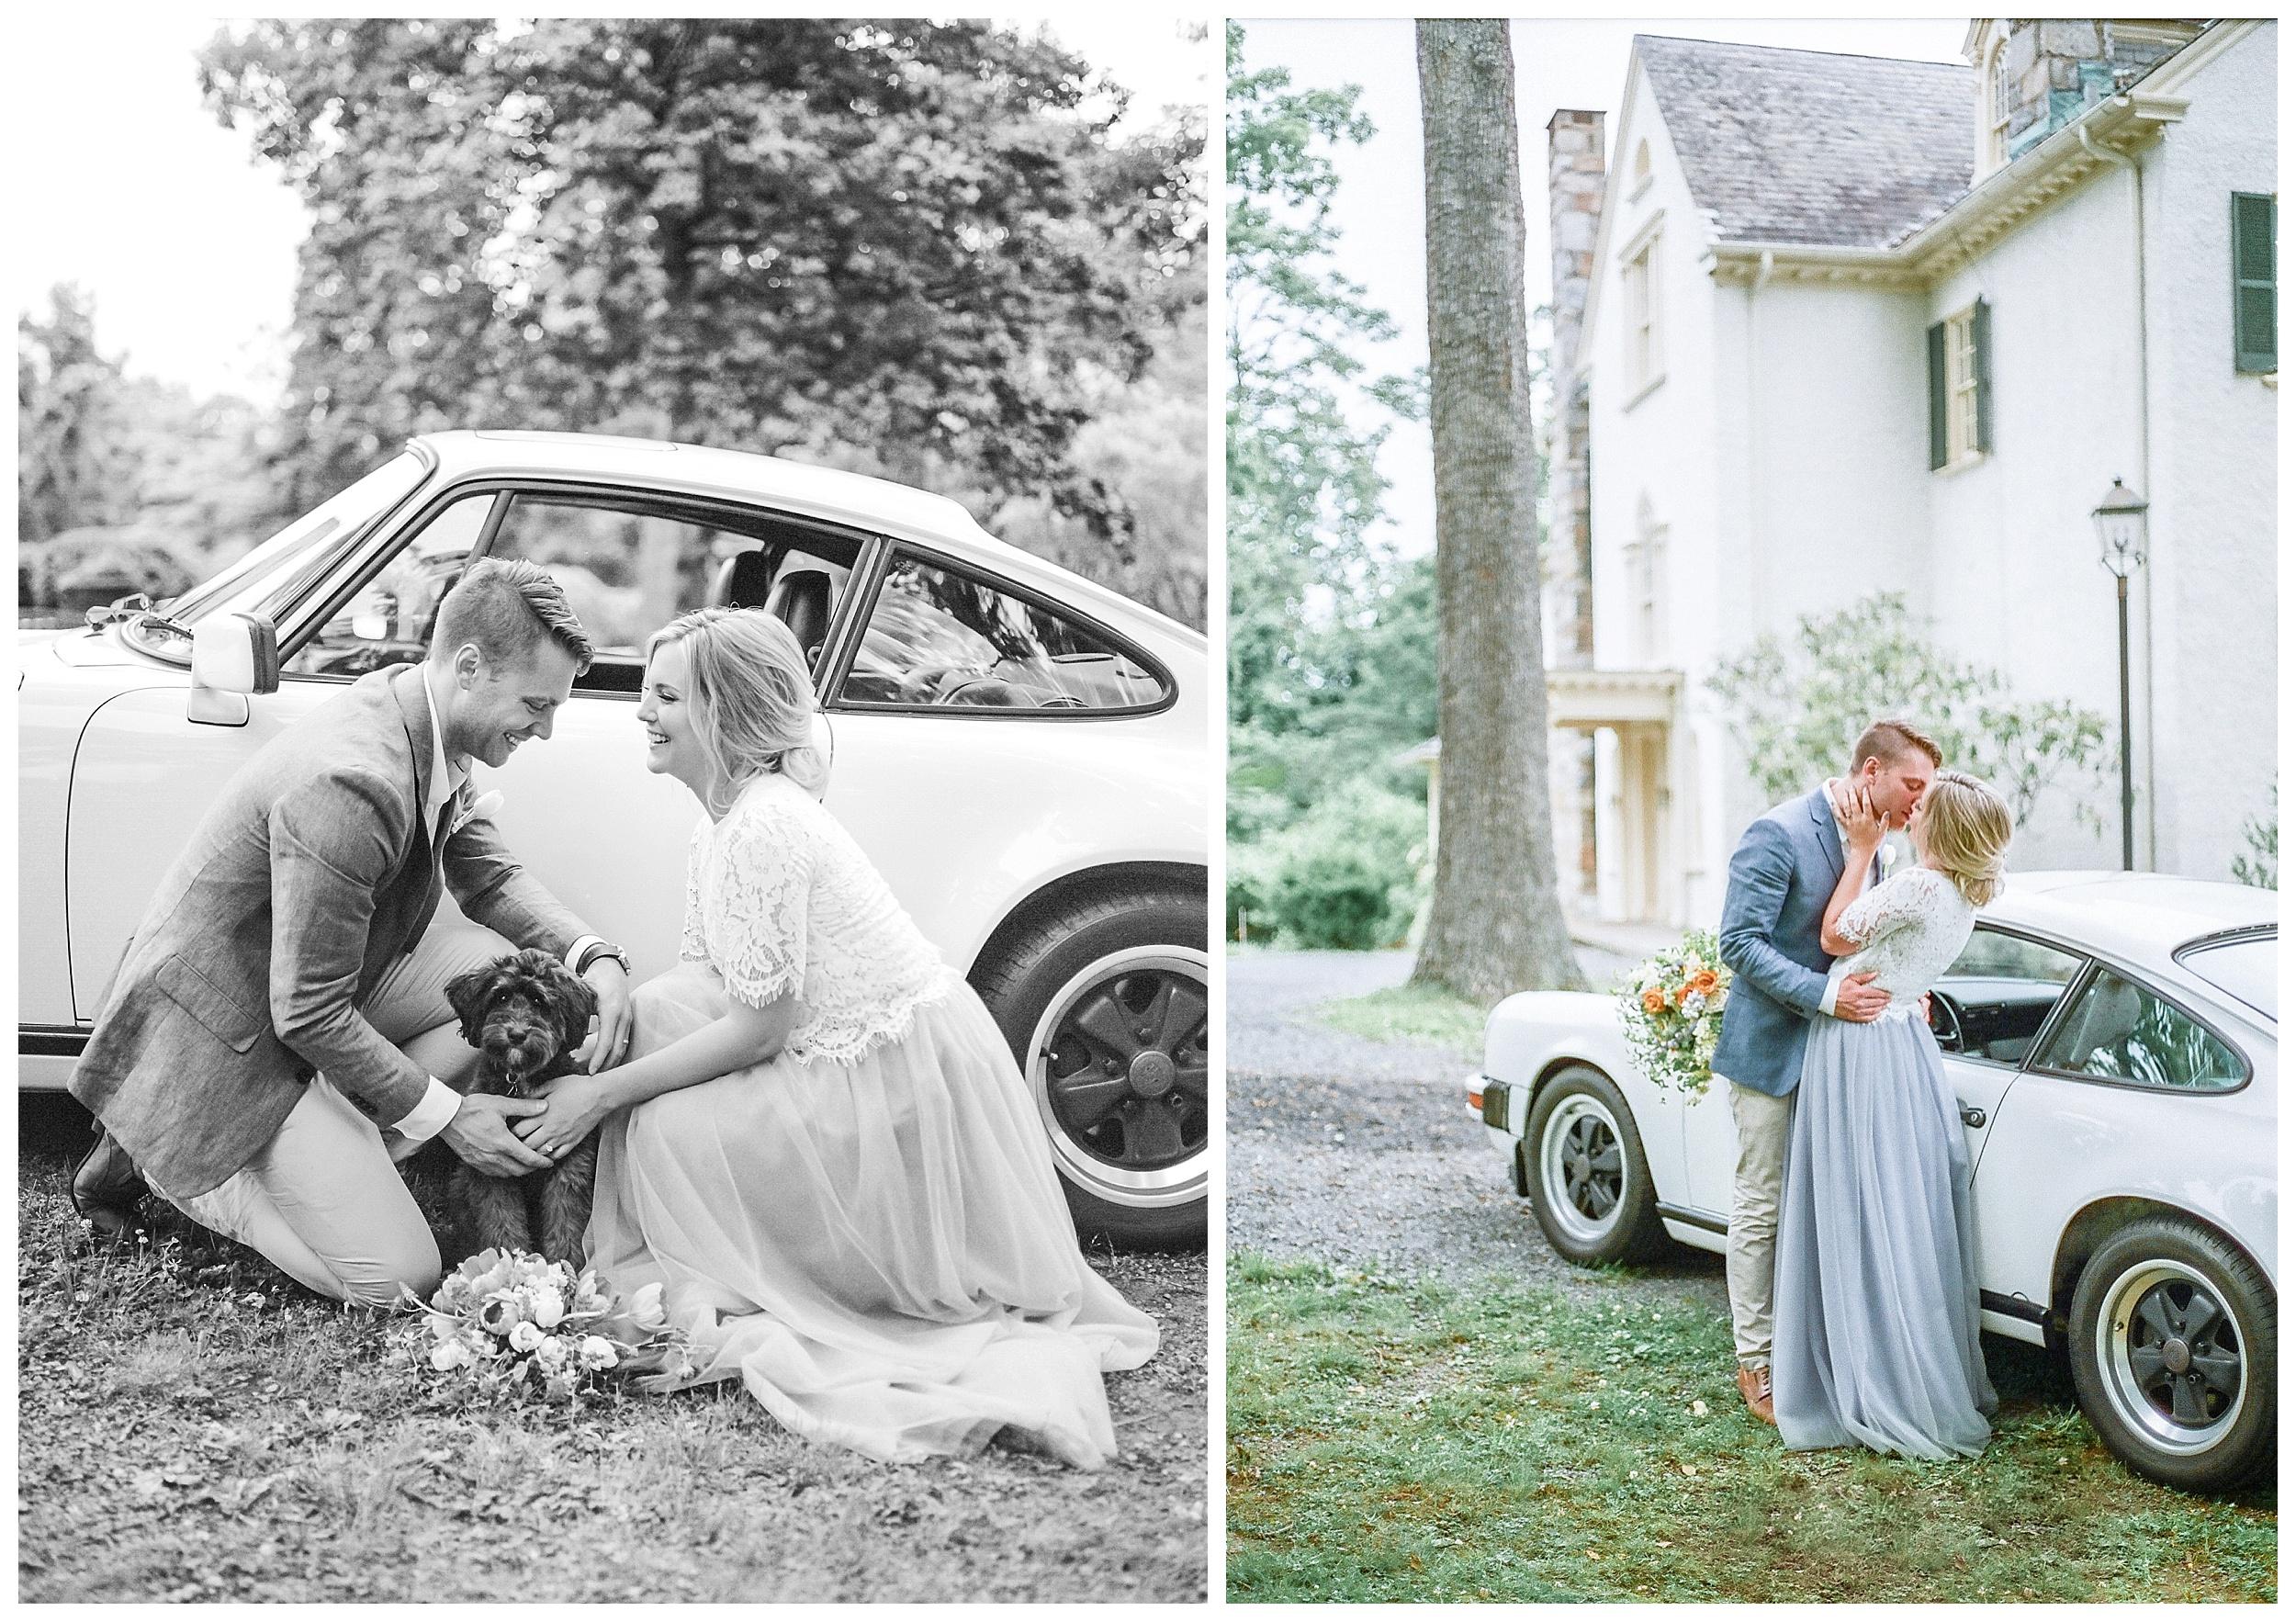 Rust Manor Wedding   Virginia Wedding Photographer Kir Tuben_0027.jpg